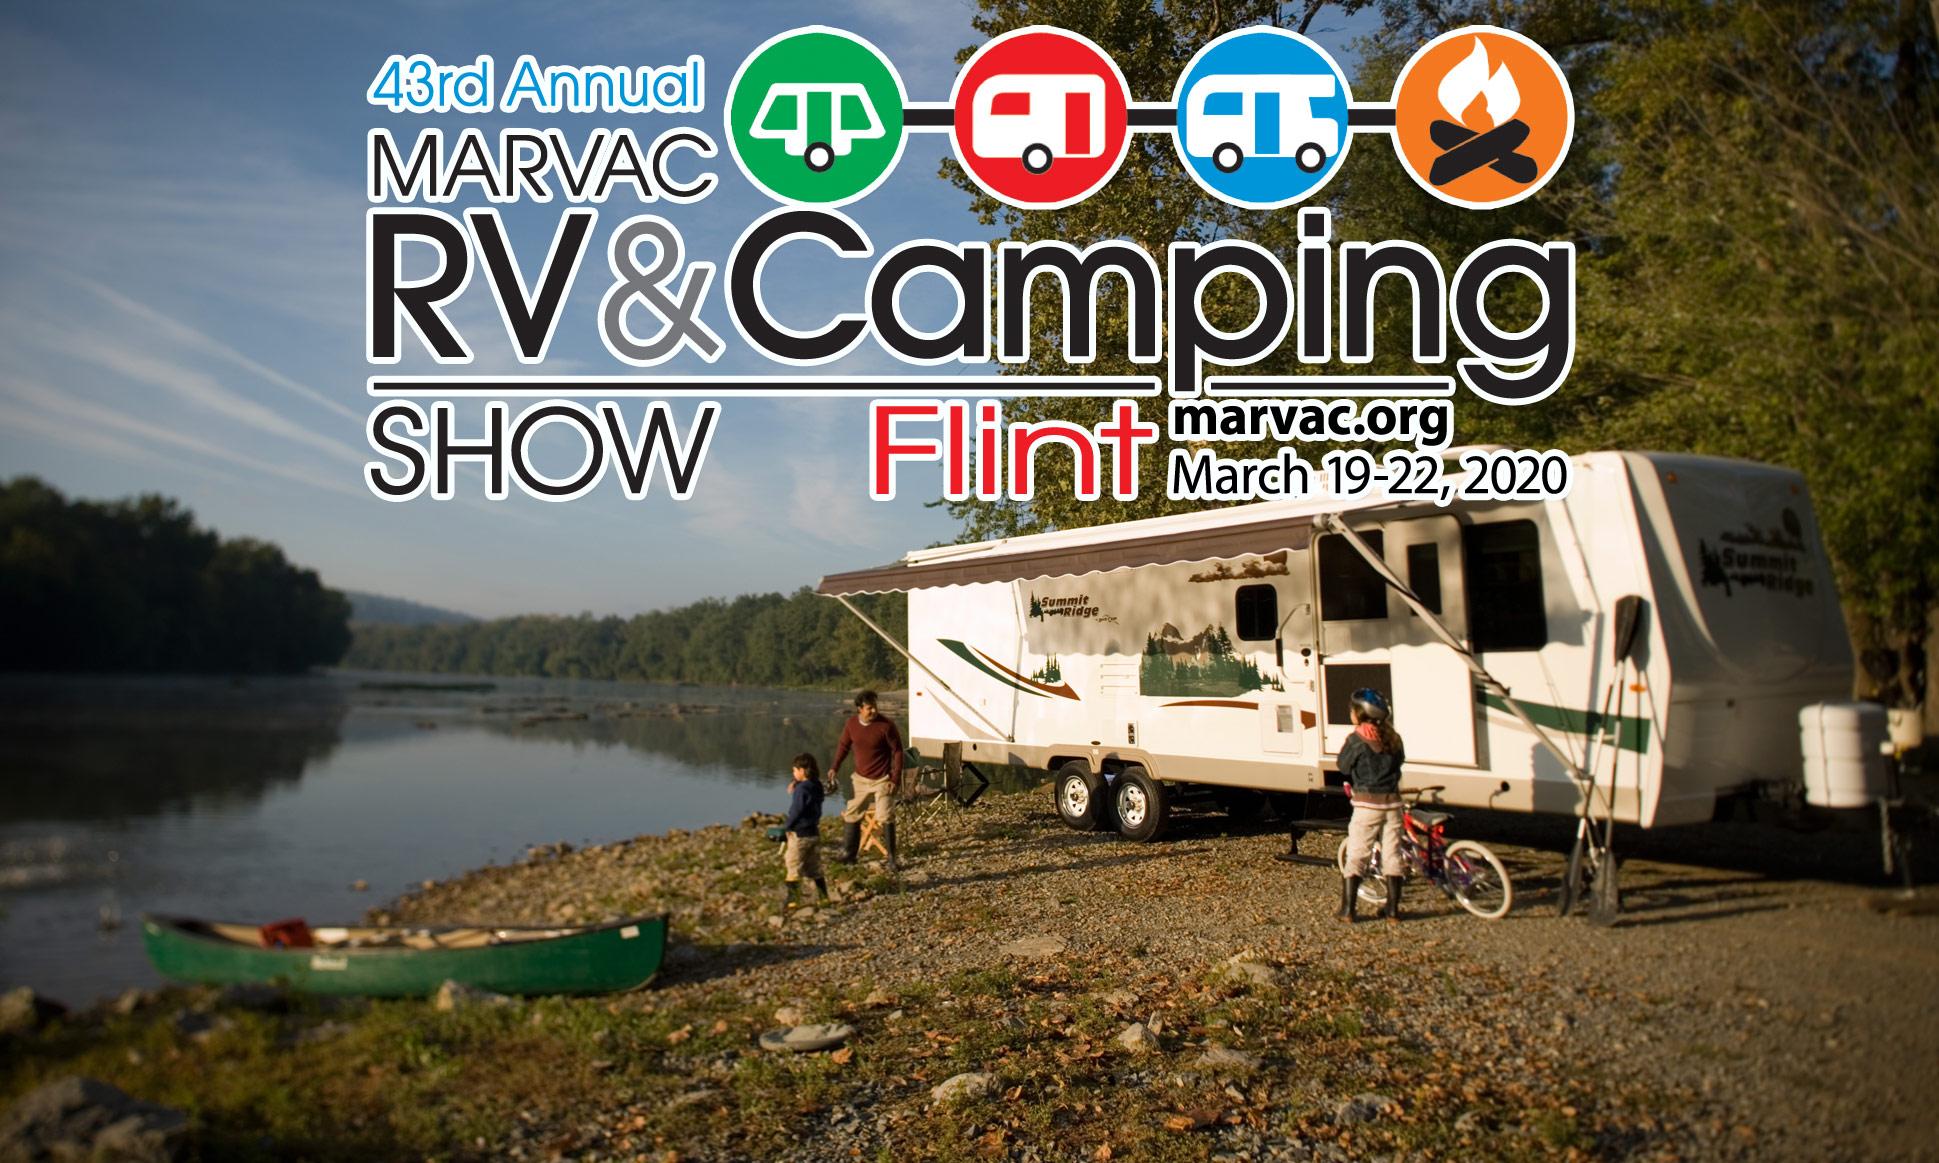 Events Calendar February 2020 Flint Mi The 43rd Annual Flint RV & Camping Show Show is March 19 22, 2020